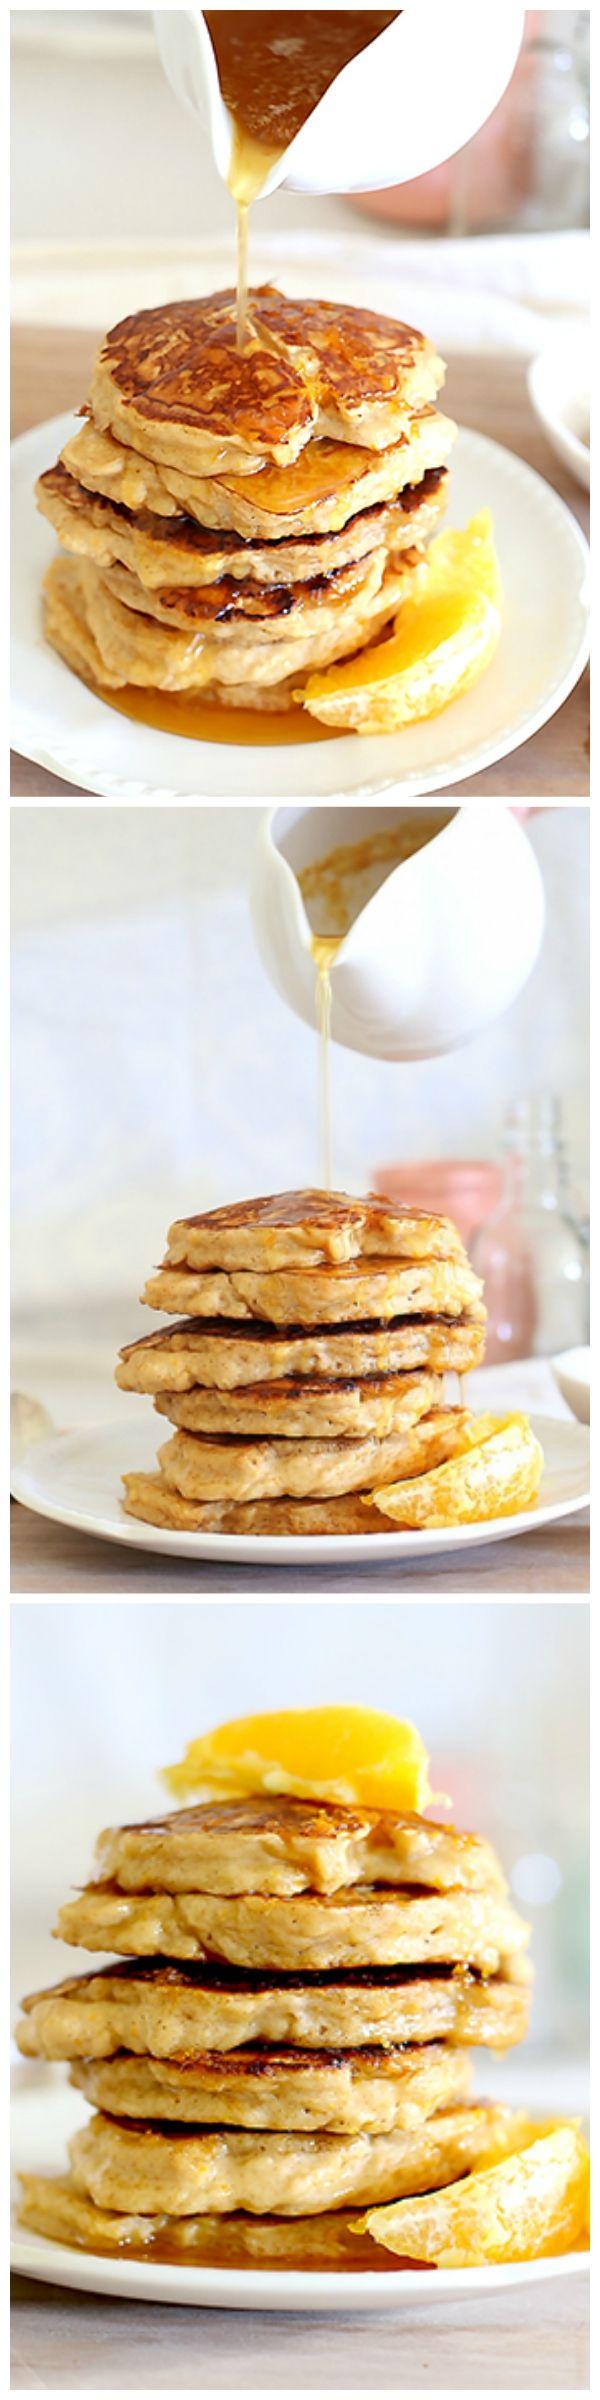 Orange ricotta hotcakes with orange honey syrup - Fluffy, soft ricotta ...